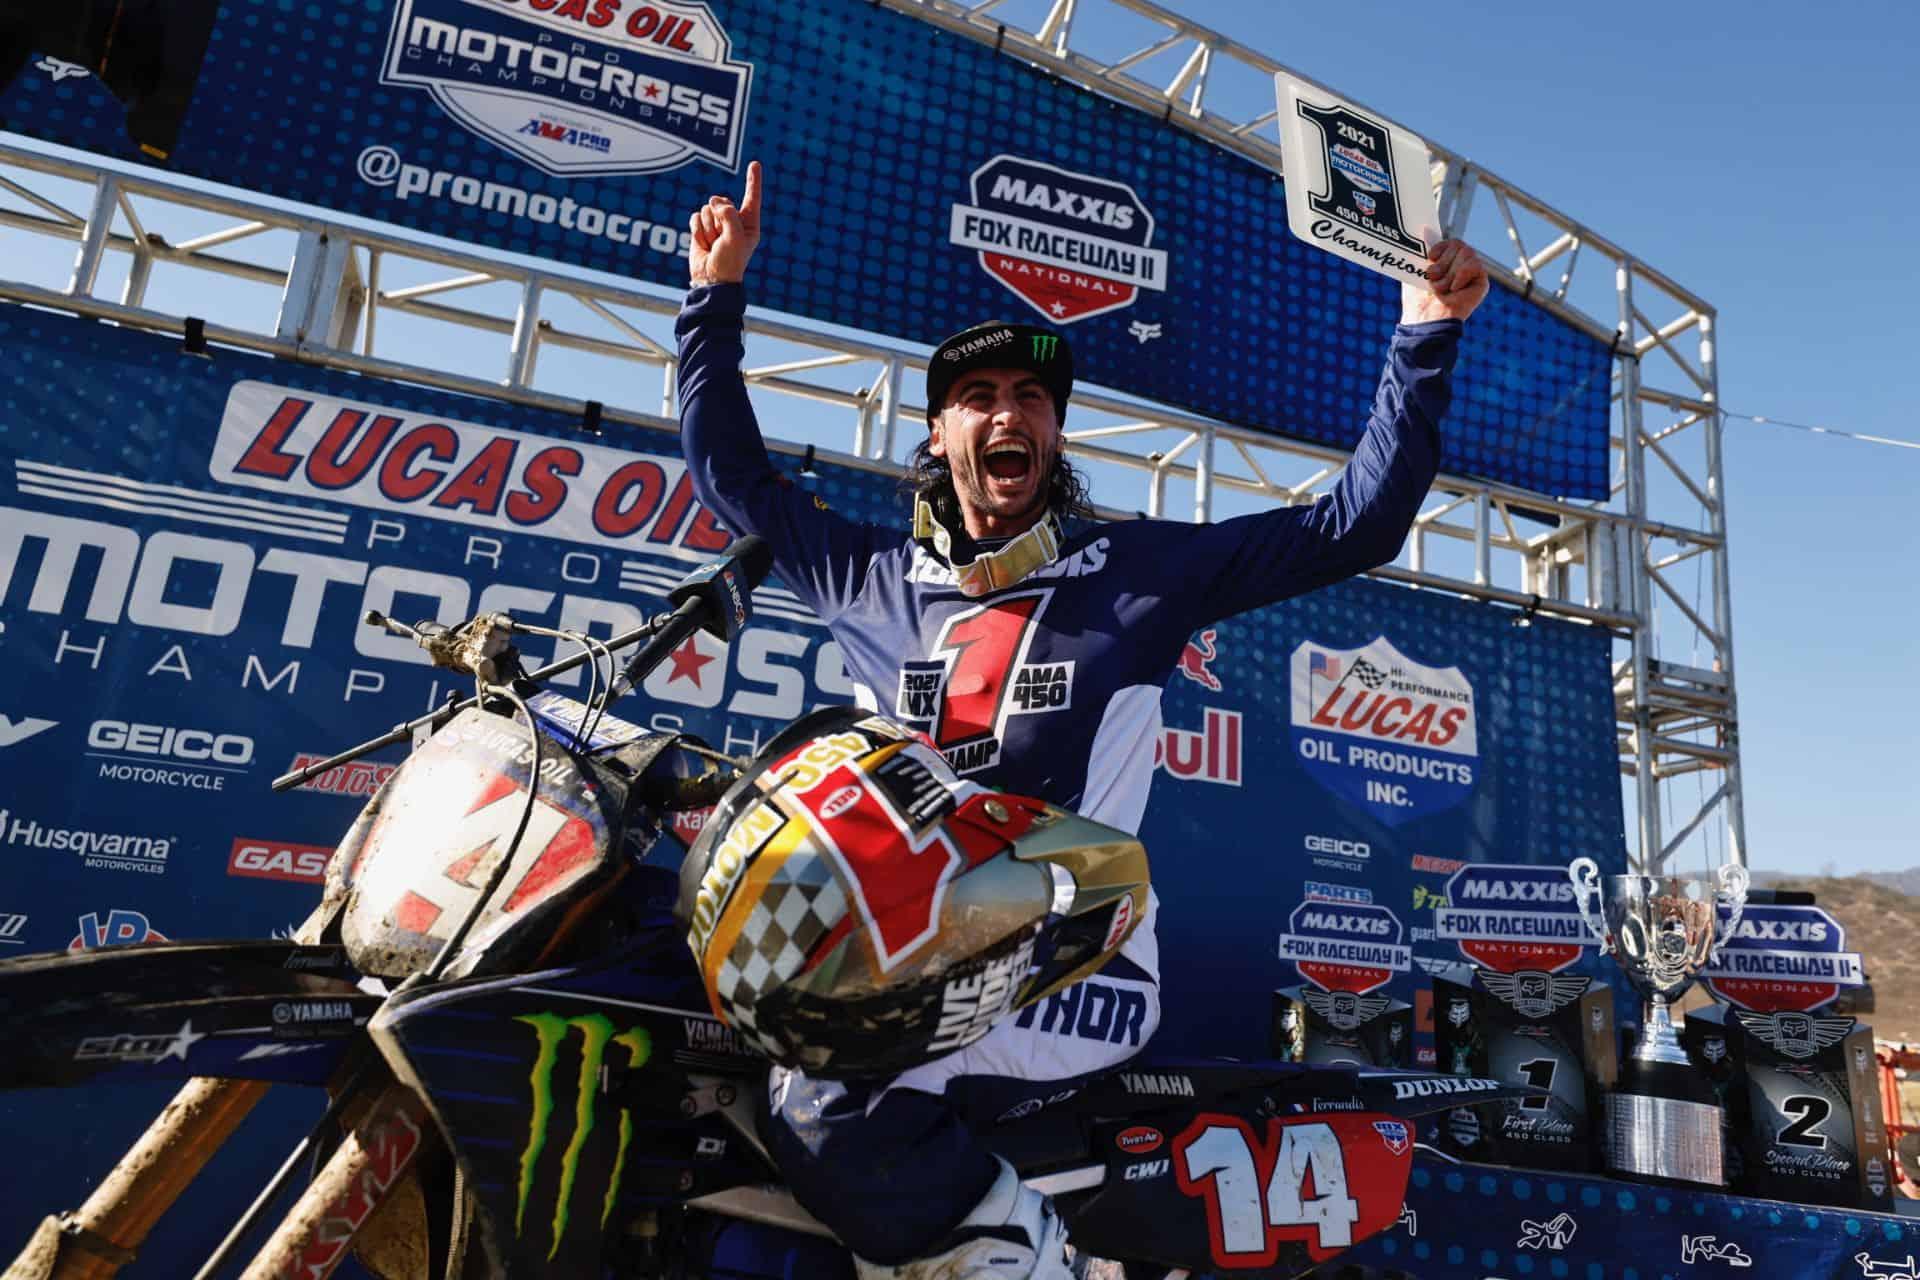 Yamaha präsentiert seinen Rückblick auf die AMA Pro Motocross-Meisterschaft 2021